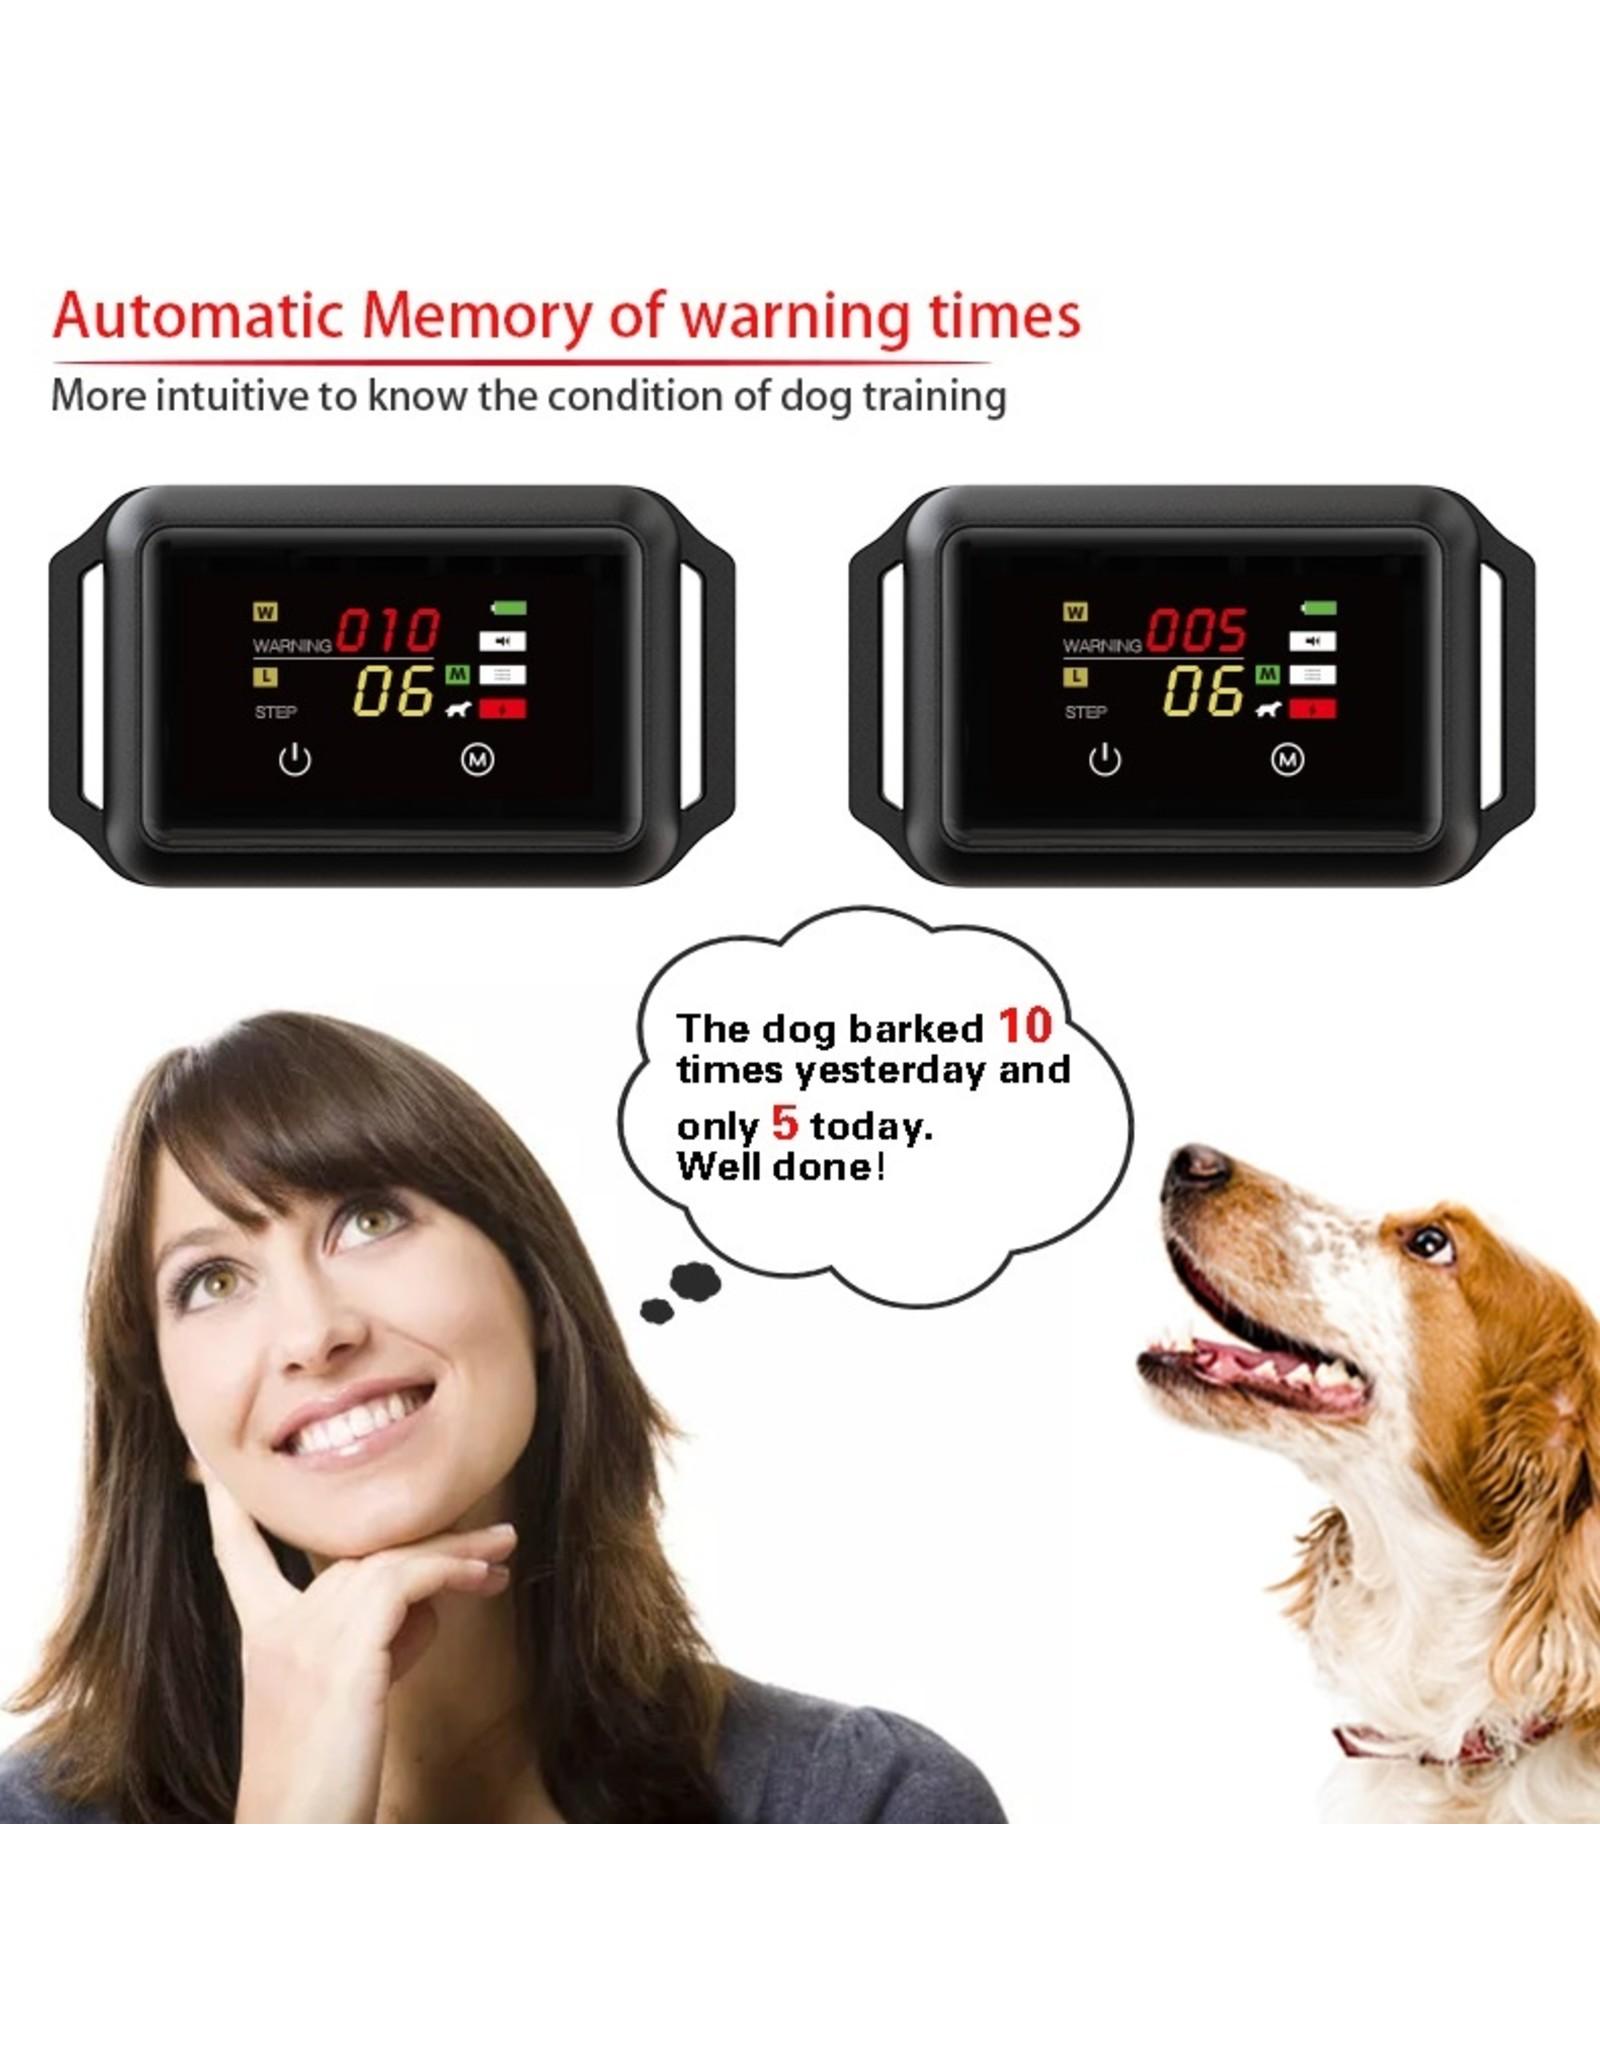 Ultramoderne Automatische Anti-Blafband BOB-800 met touchscreen en data check na gebruik – waterproof